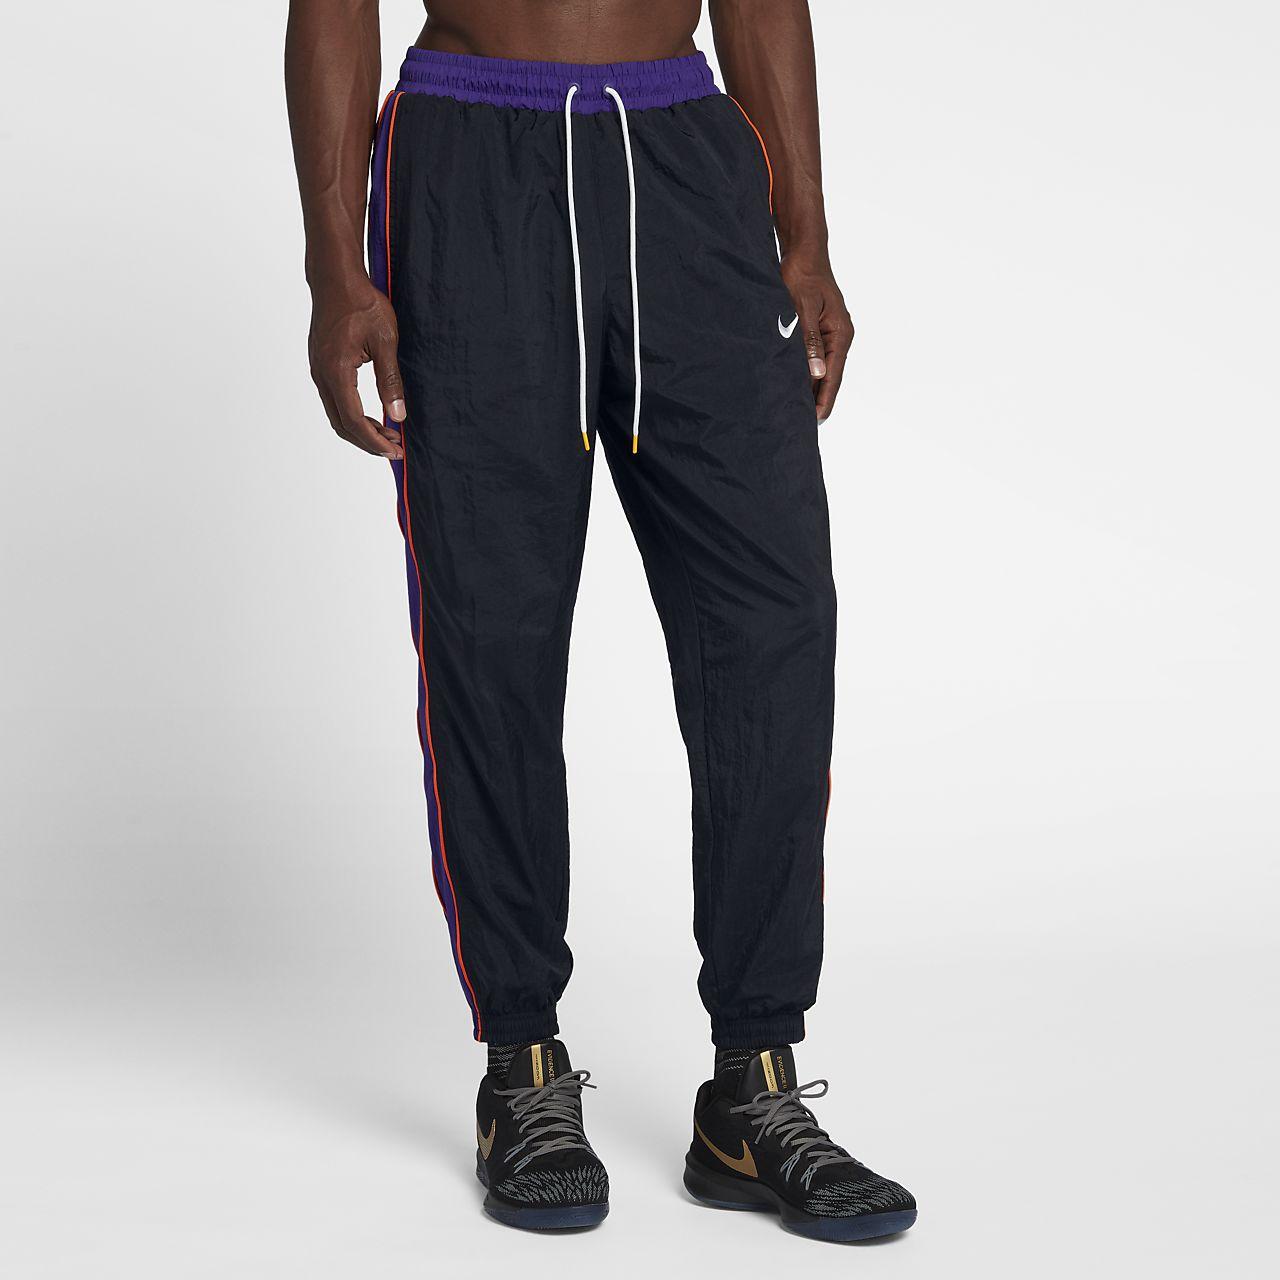 270e53bd660b Nike Throwback Men s Woven Tracksuit Basketball Pants. Nike.com